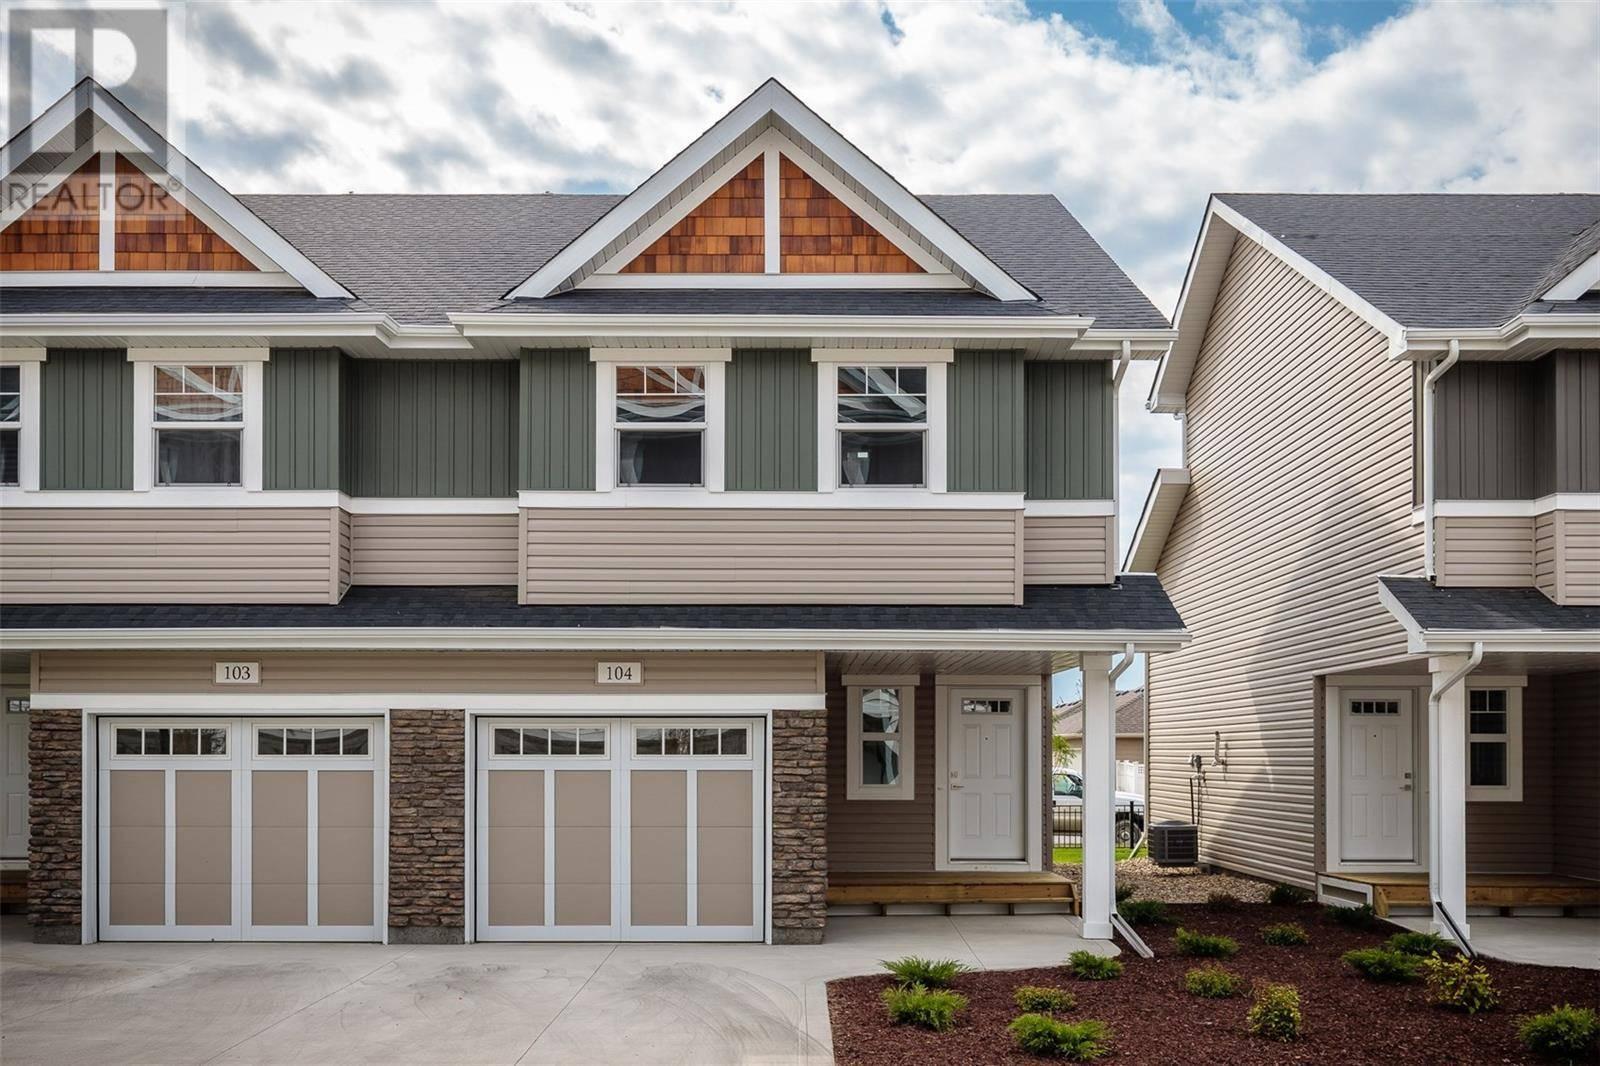 House for sale at 315 Dickson Cres Unit 104 Saskatoon Saskatchewan - MLS: SK782631